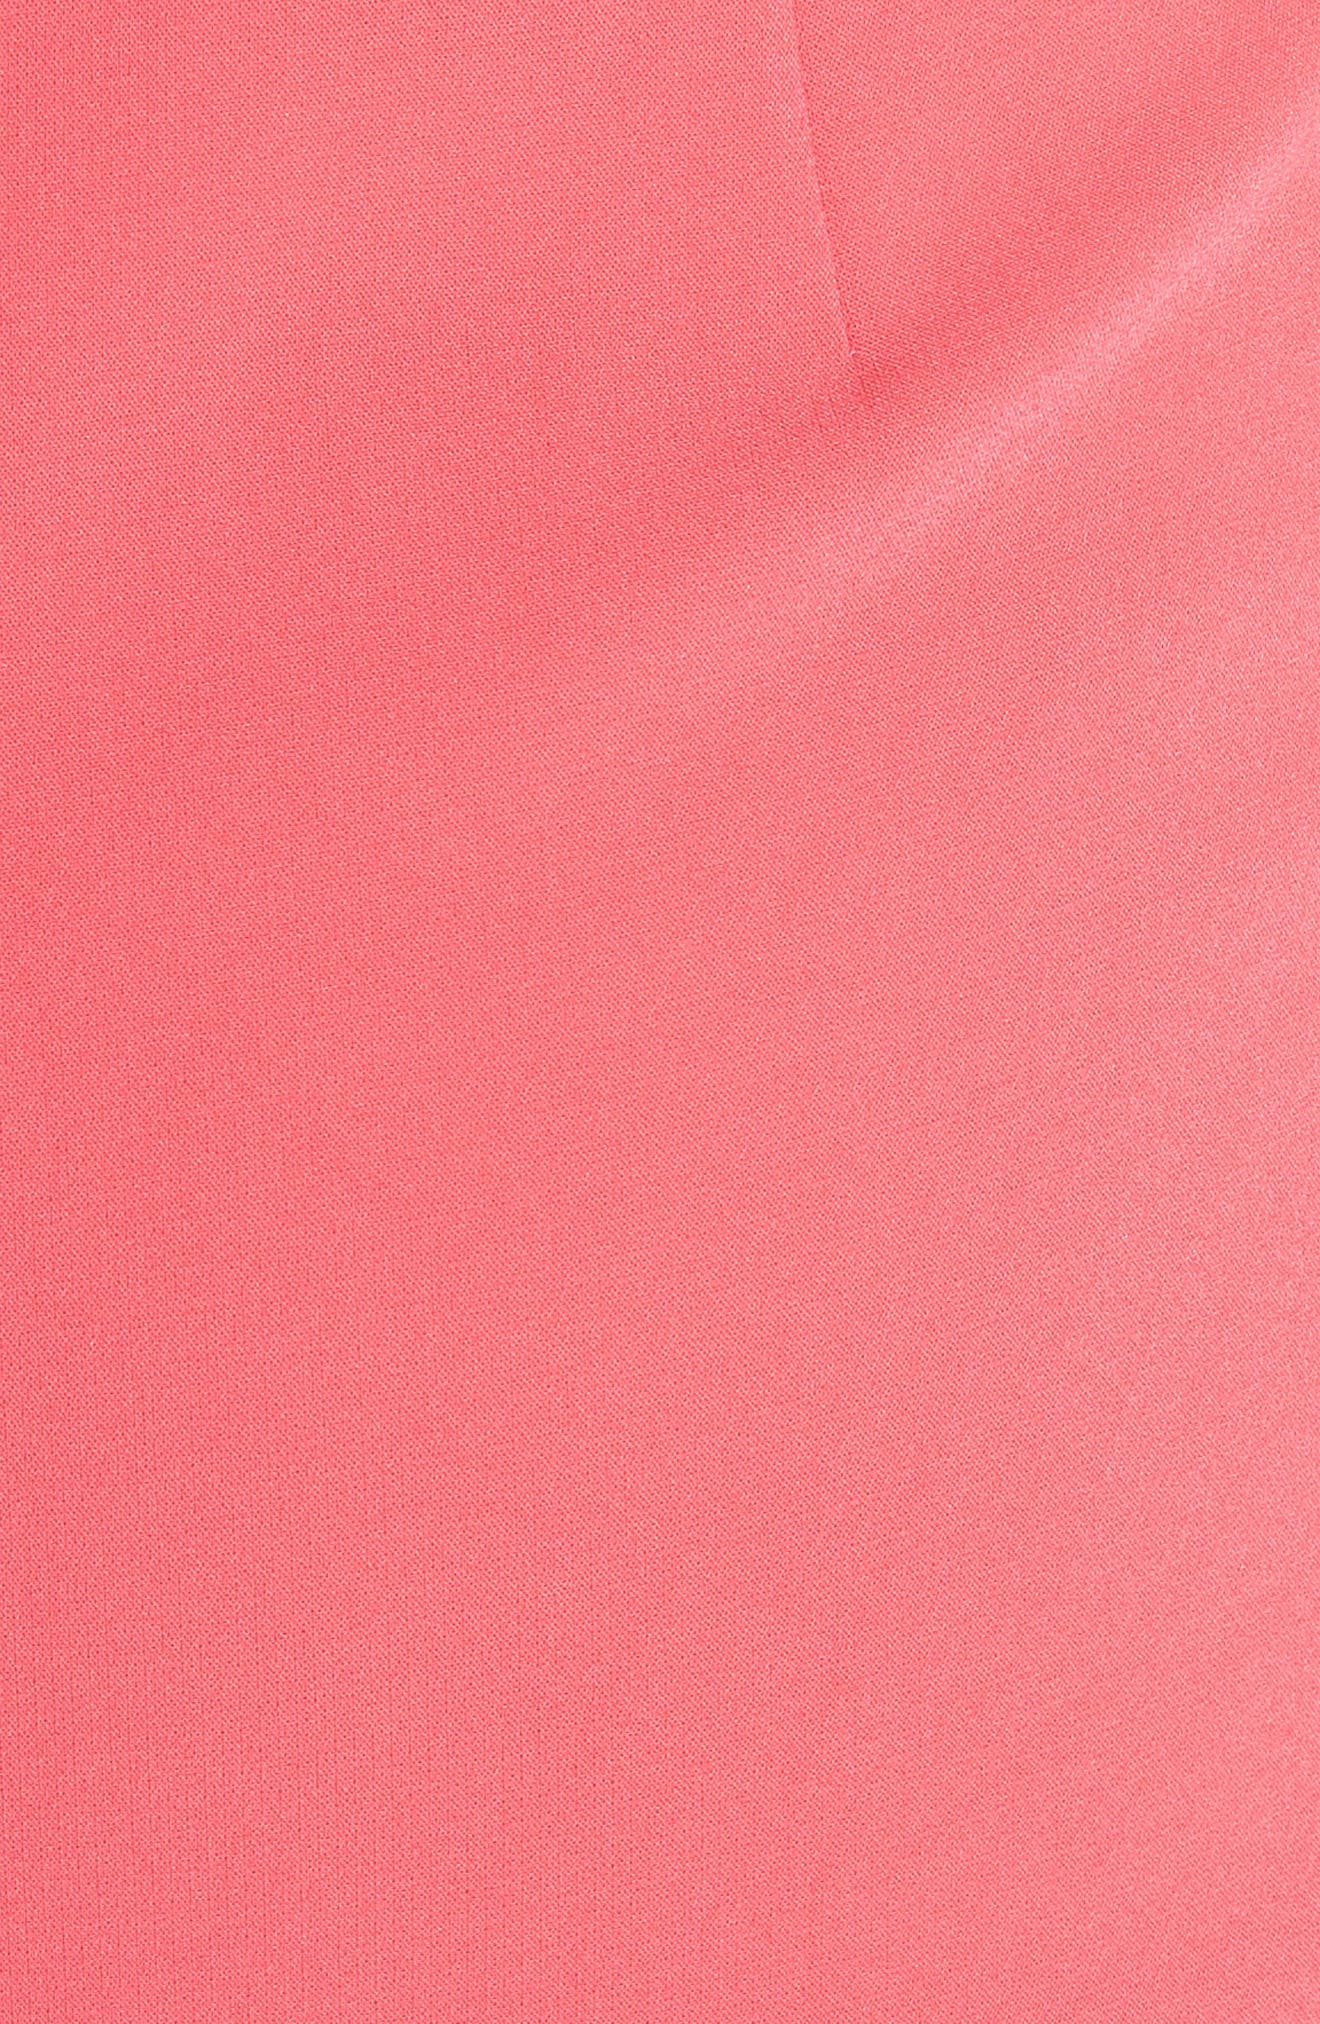 Andalasia Sleeveless Fit & Flare Dress,                             Alternate thumbnail 5, color,                             Watermelon